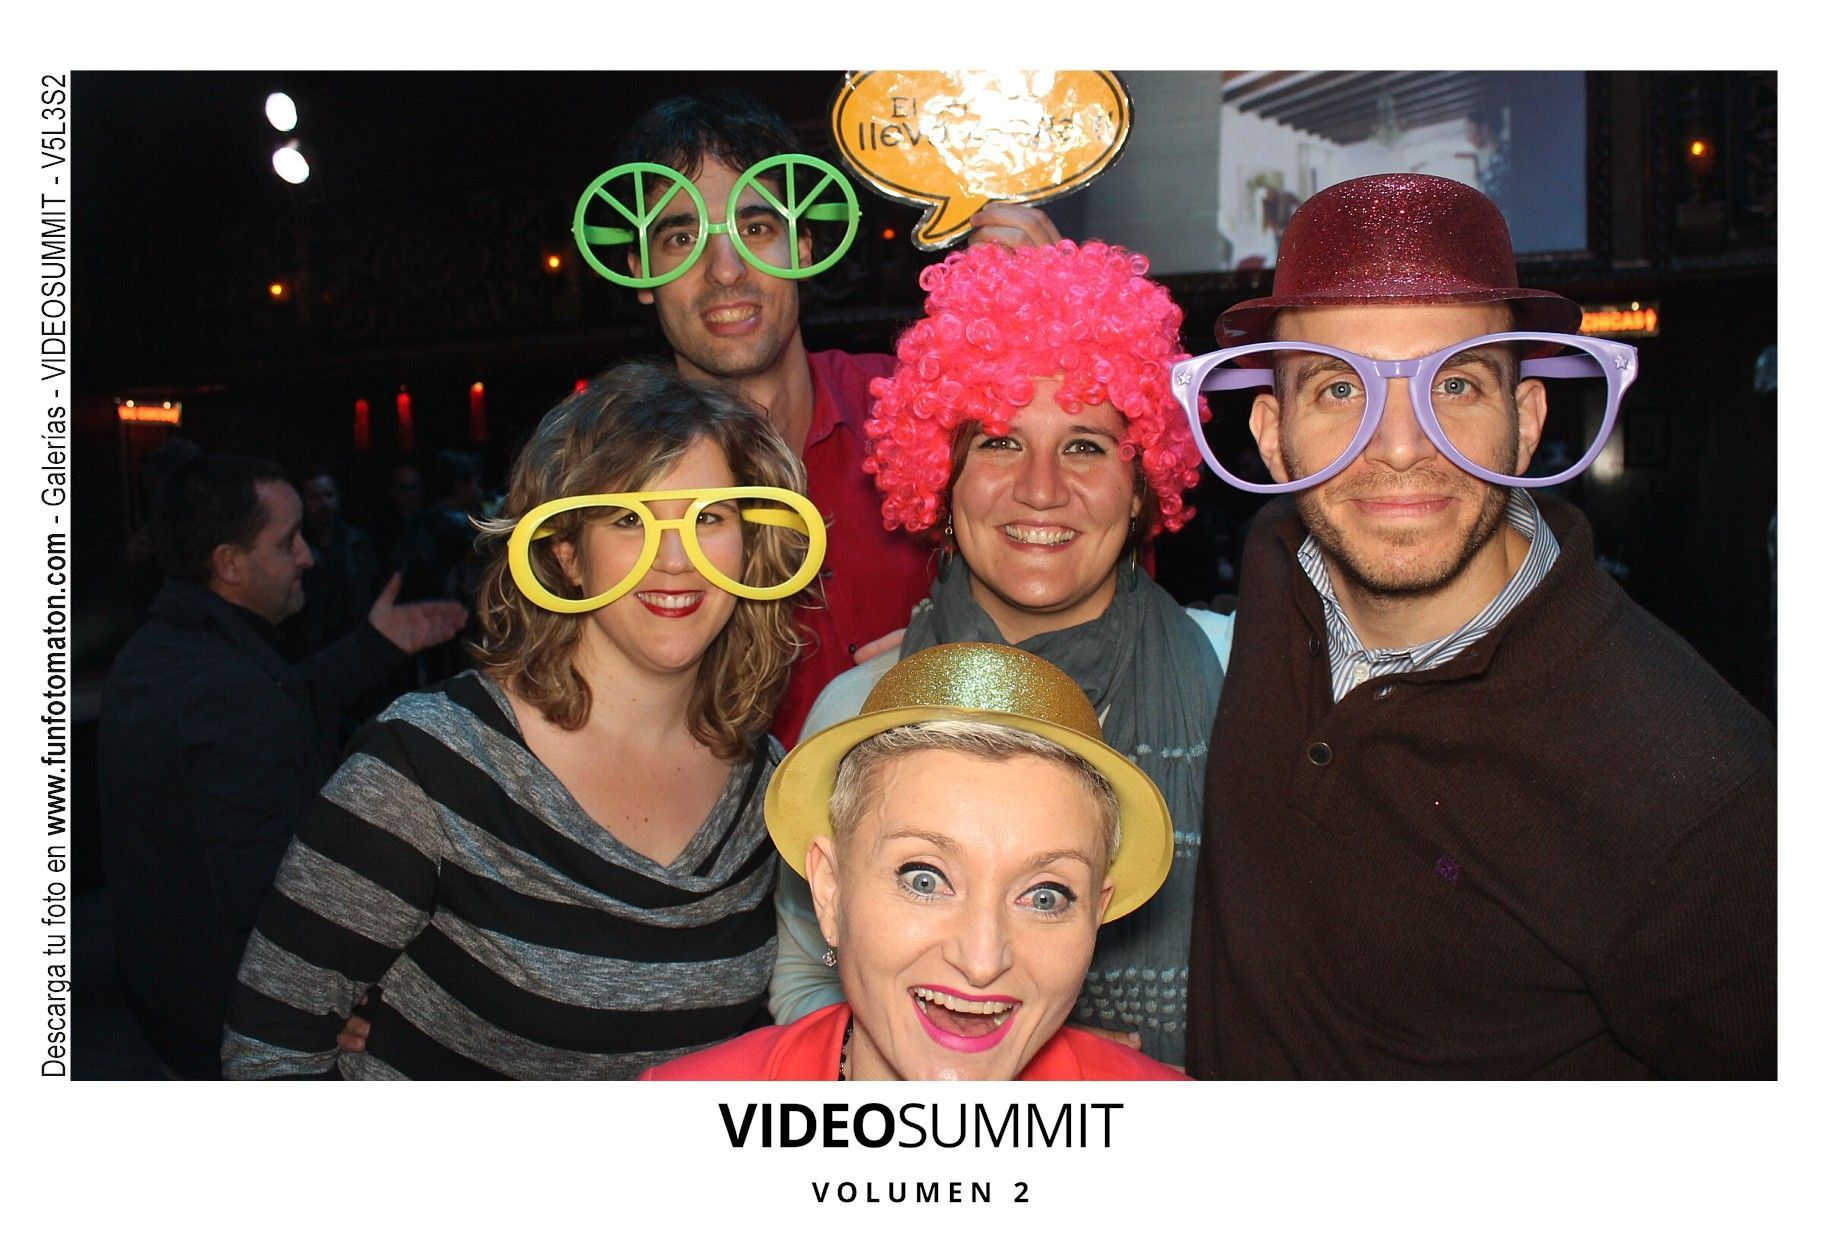 videosummit-vol2-club-party-062